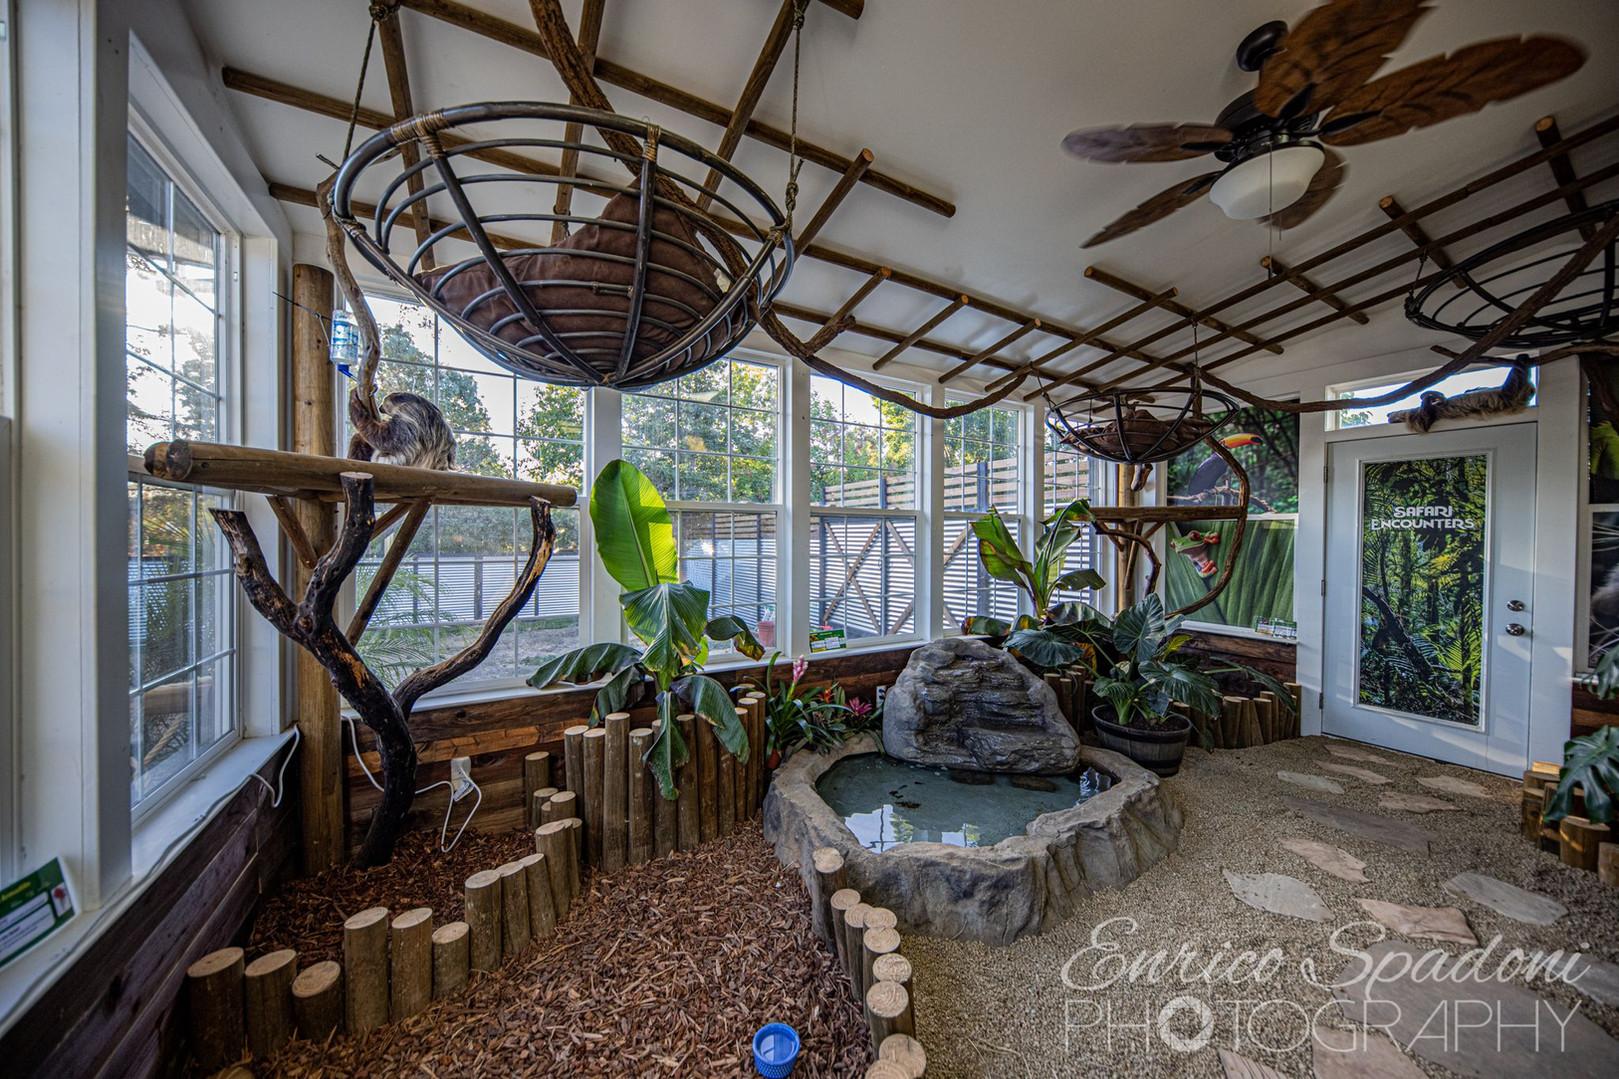 Sloth House